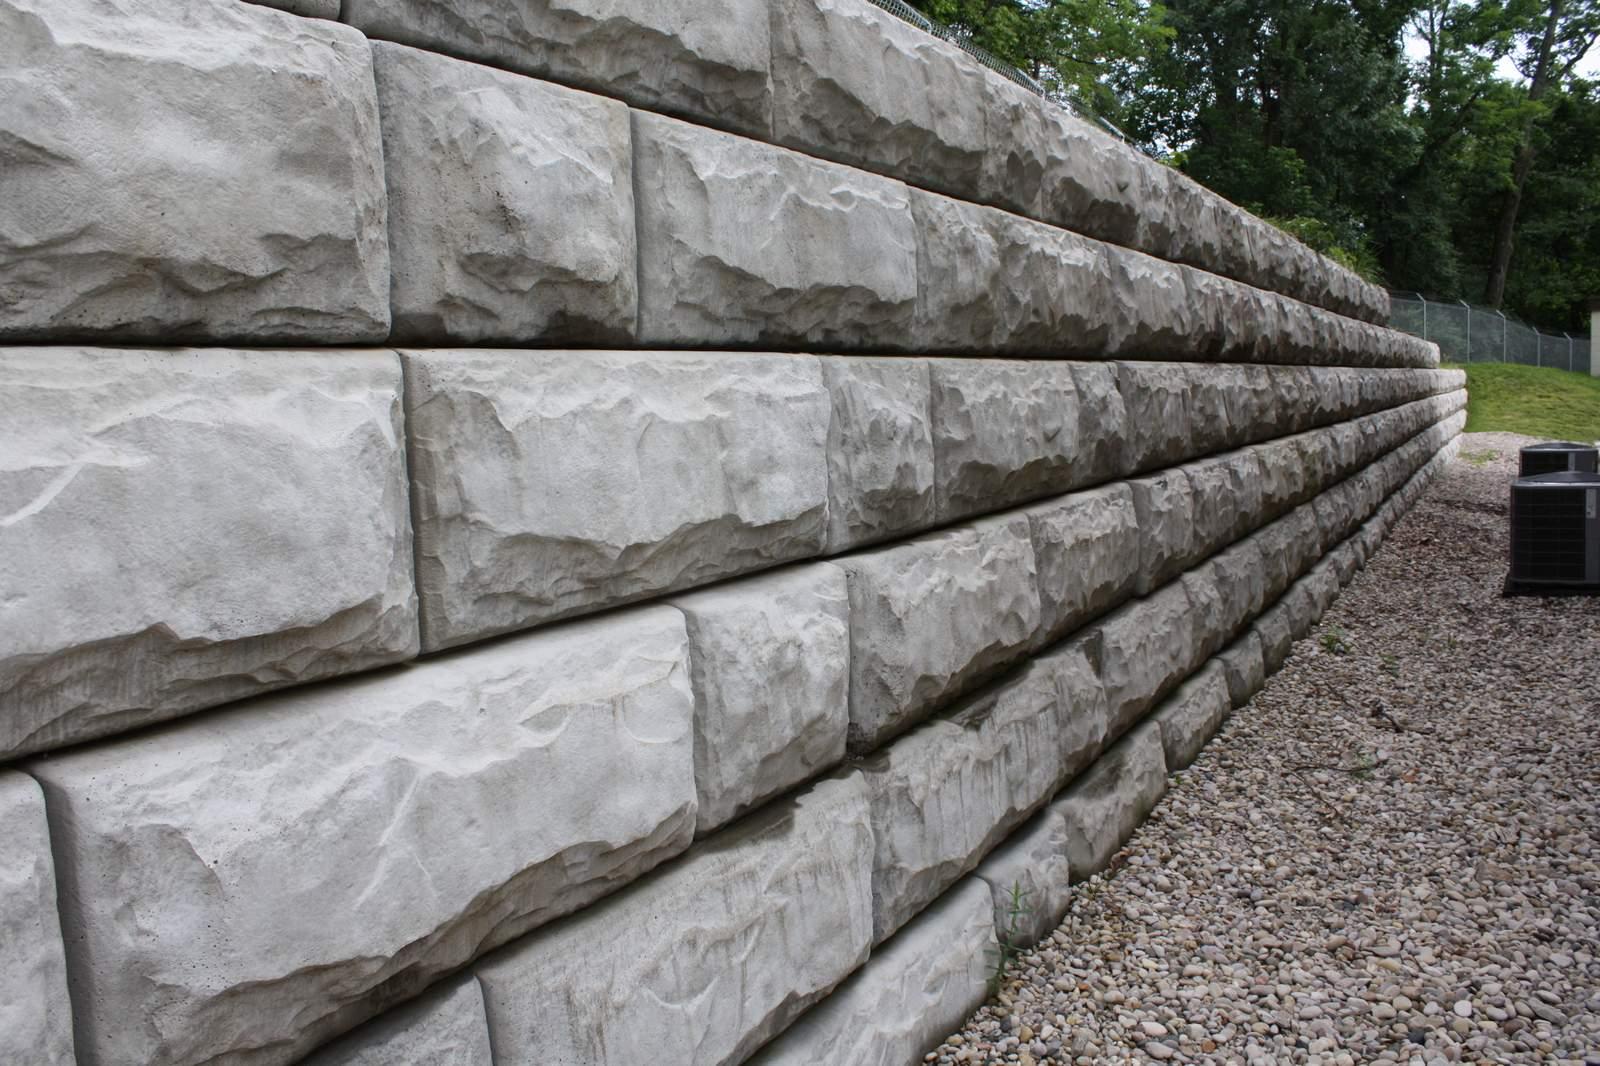 Redi-Rock wall in Cincinnati, OH